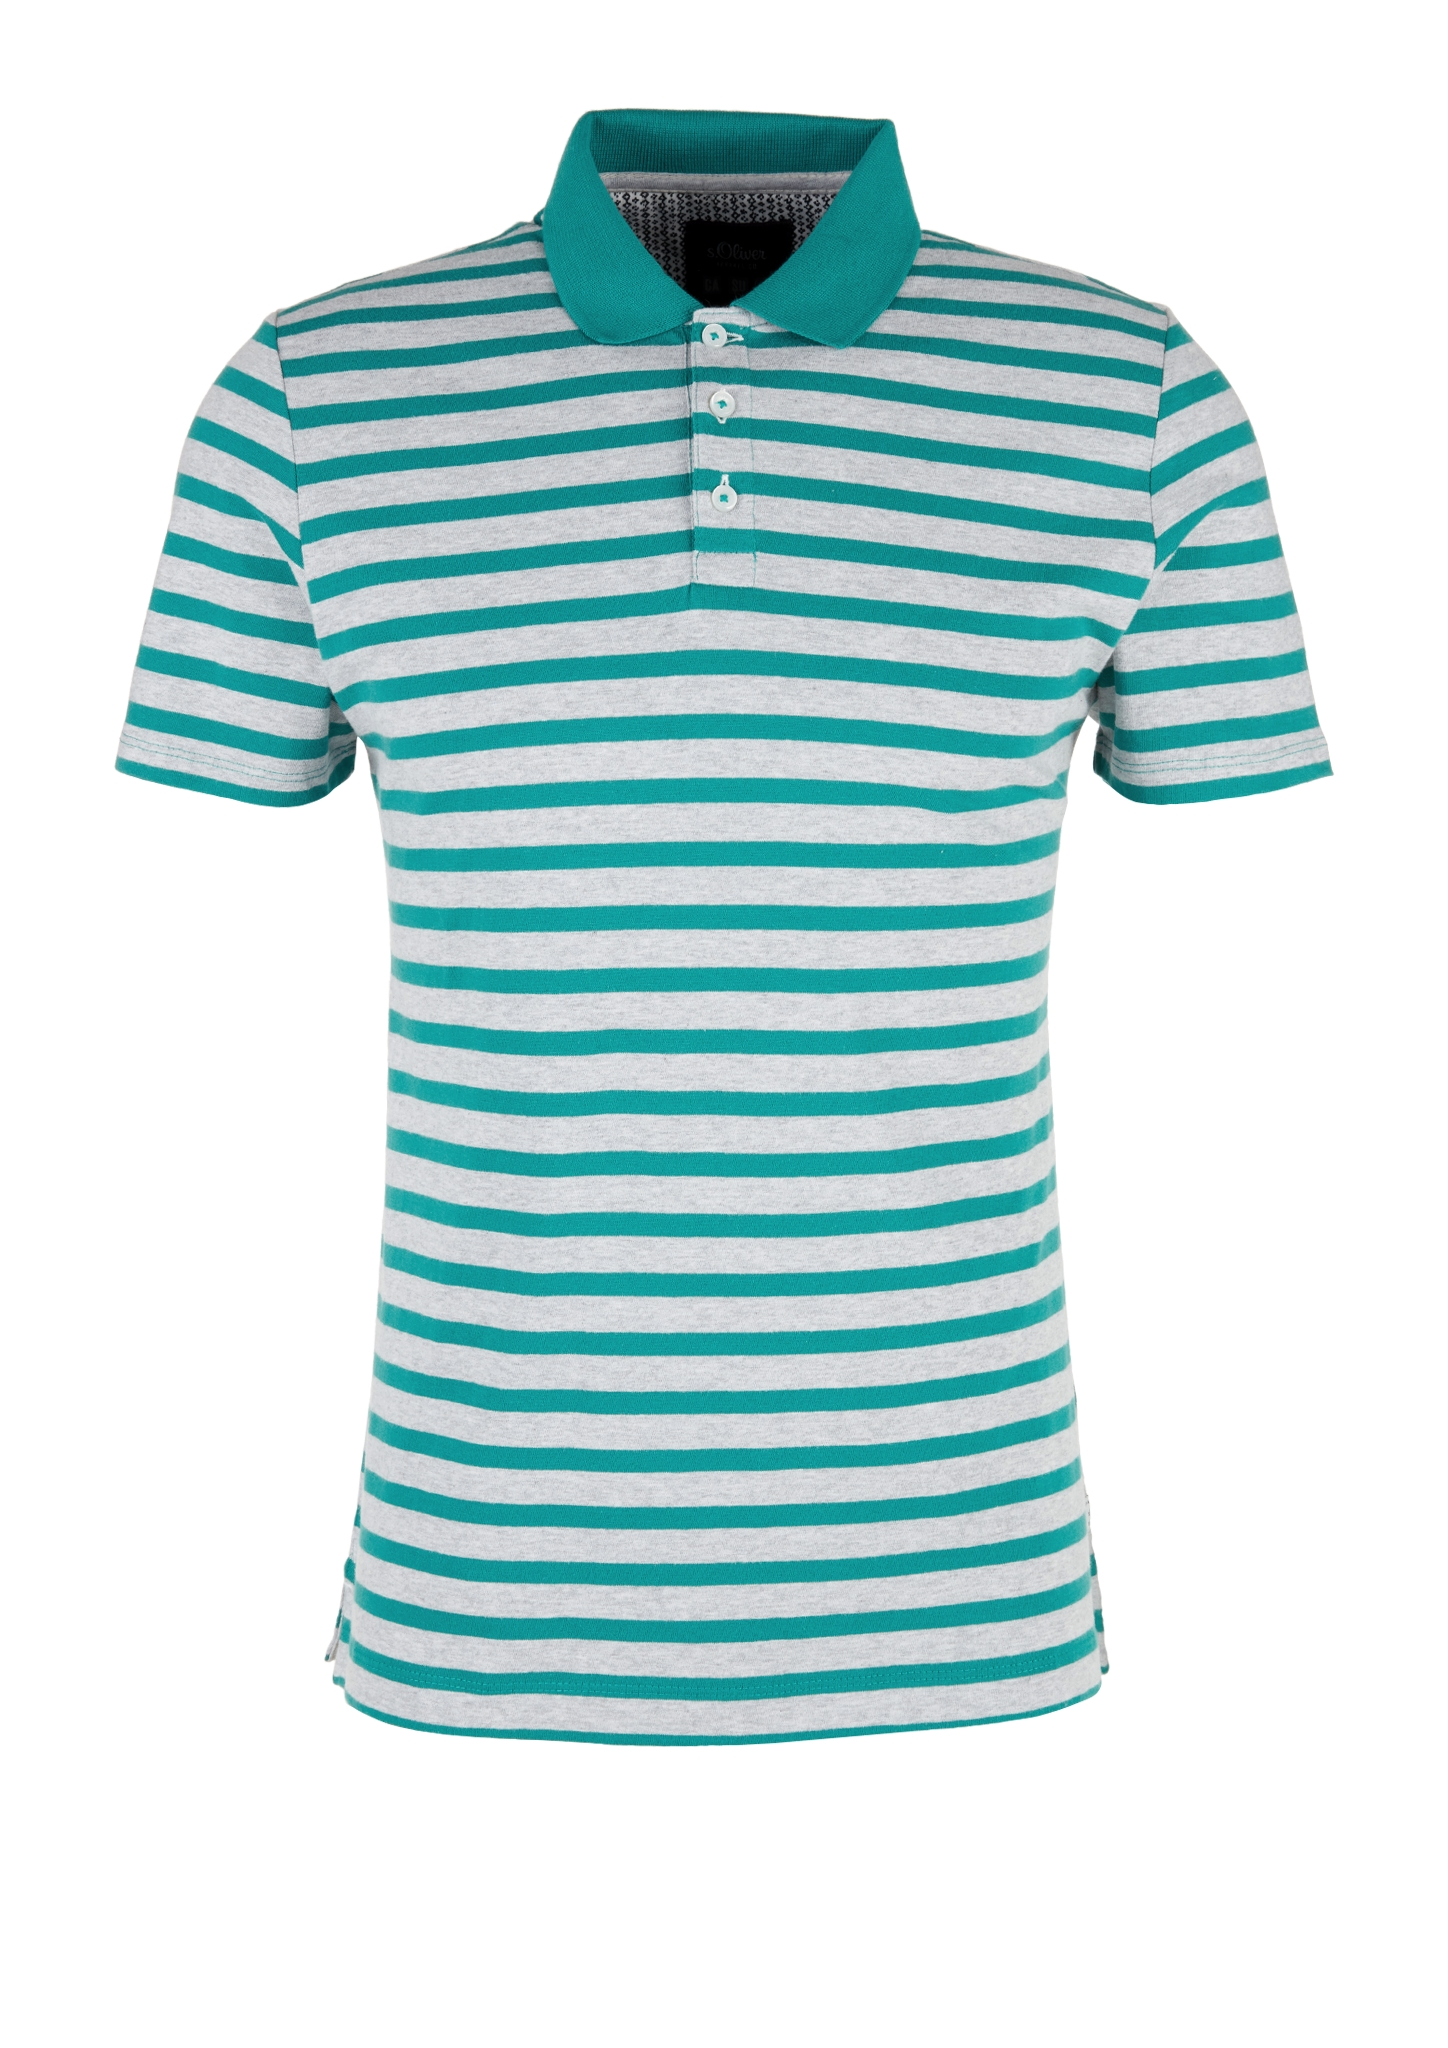 Poloshirt | Bekleidung > Polo Shirts | Grau | 100% baumwolle | s.Oliver